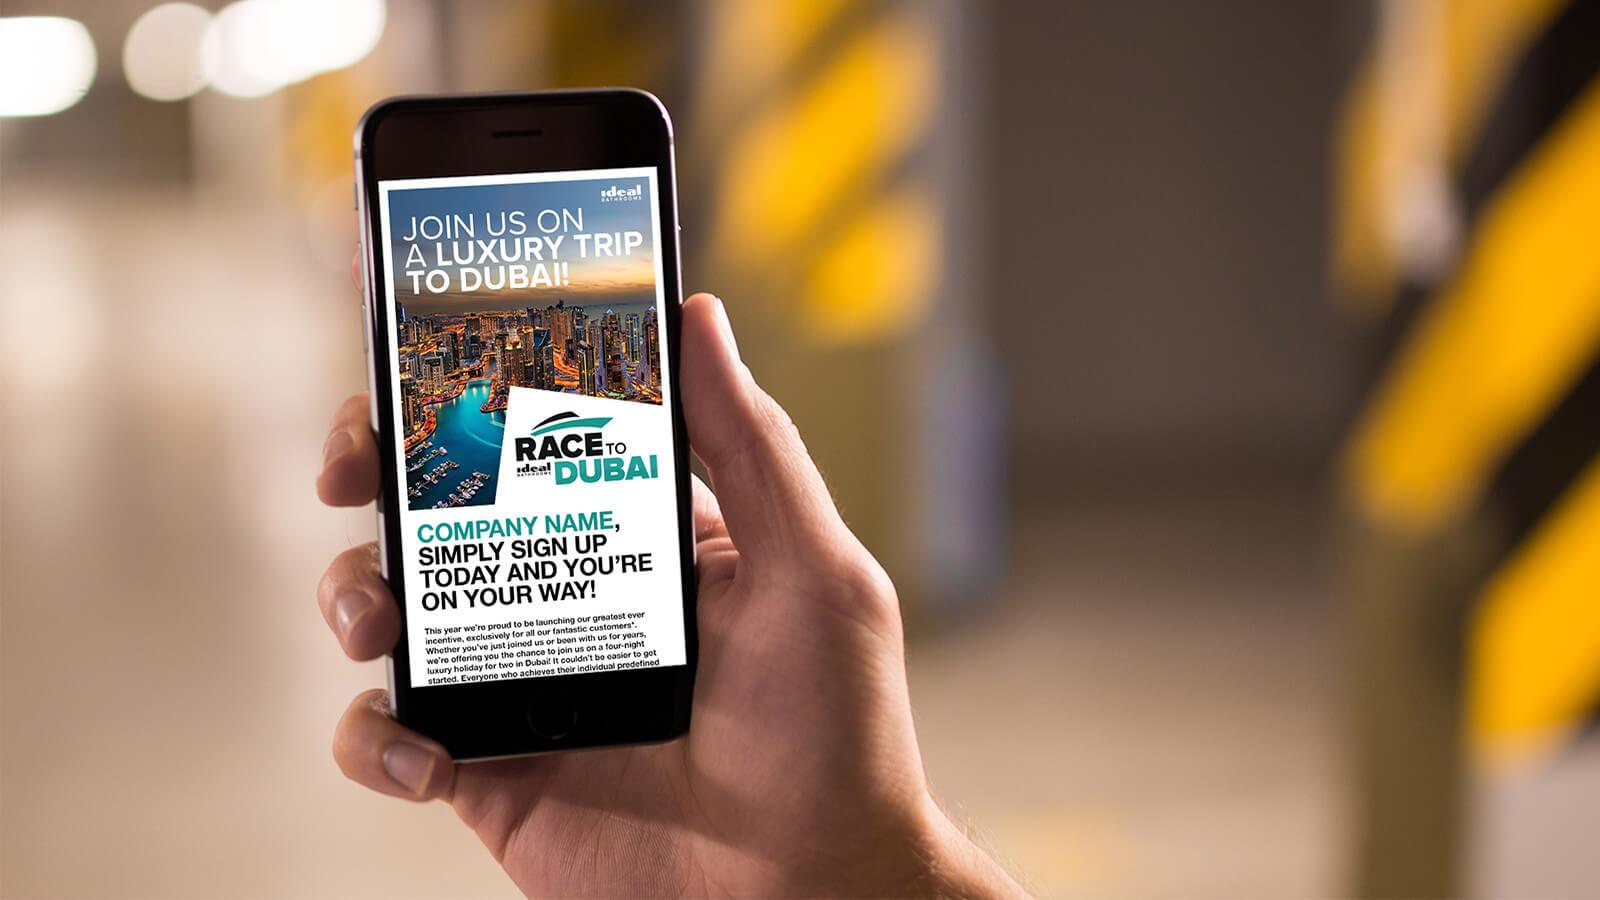 Race to Dubai Ideal kitchens mobile campaign image